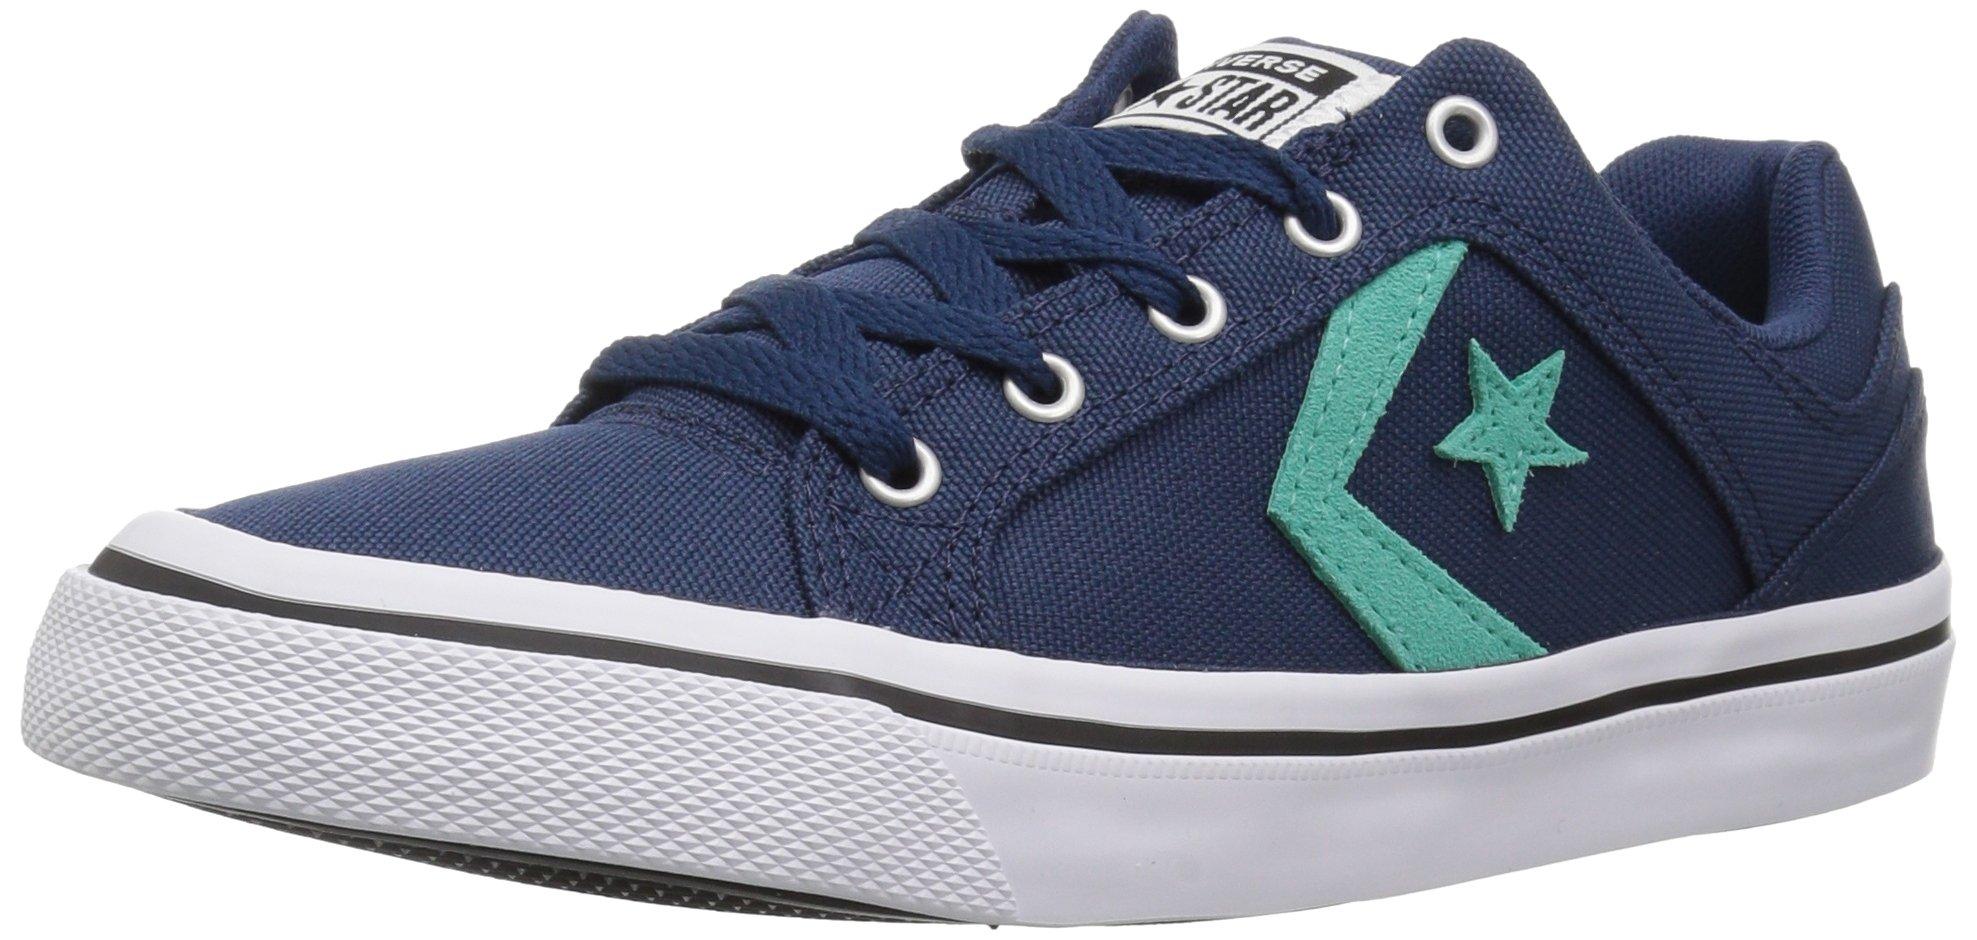 Converse Women's EL Distrito Canvas Low Top Sneaker, Navy/Pure Teal/White, 6.5 M US